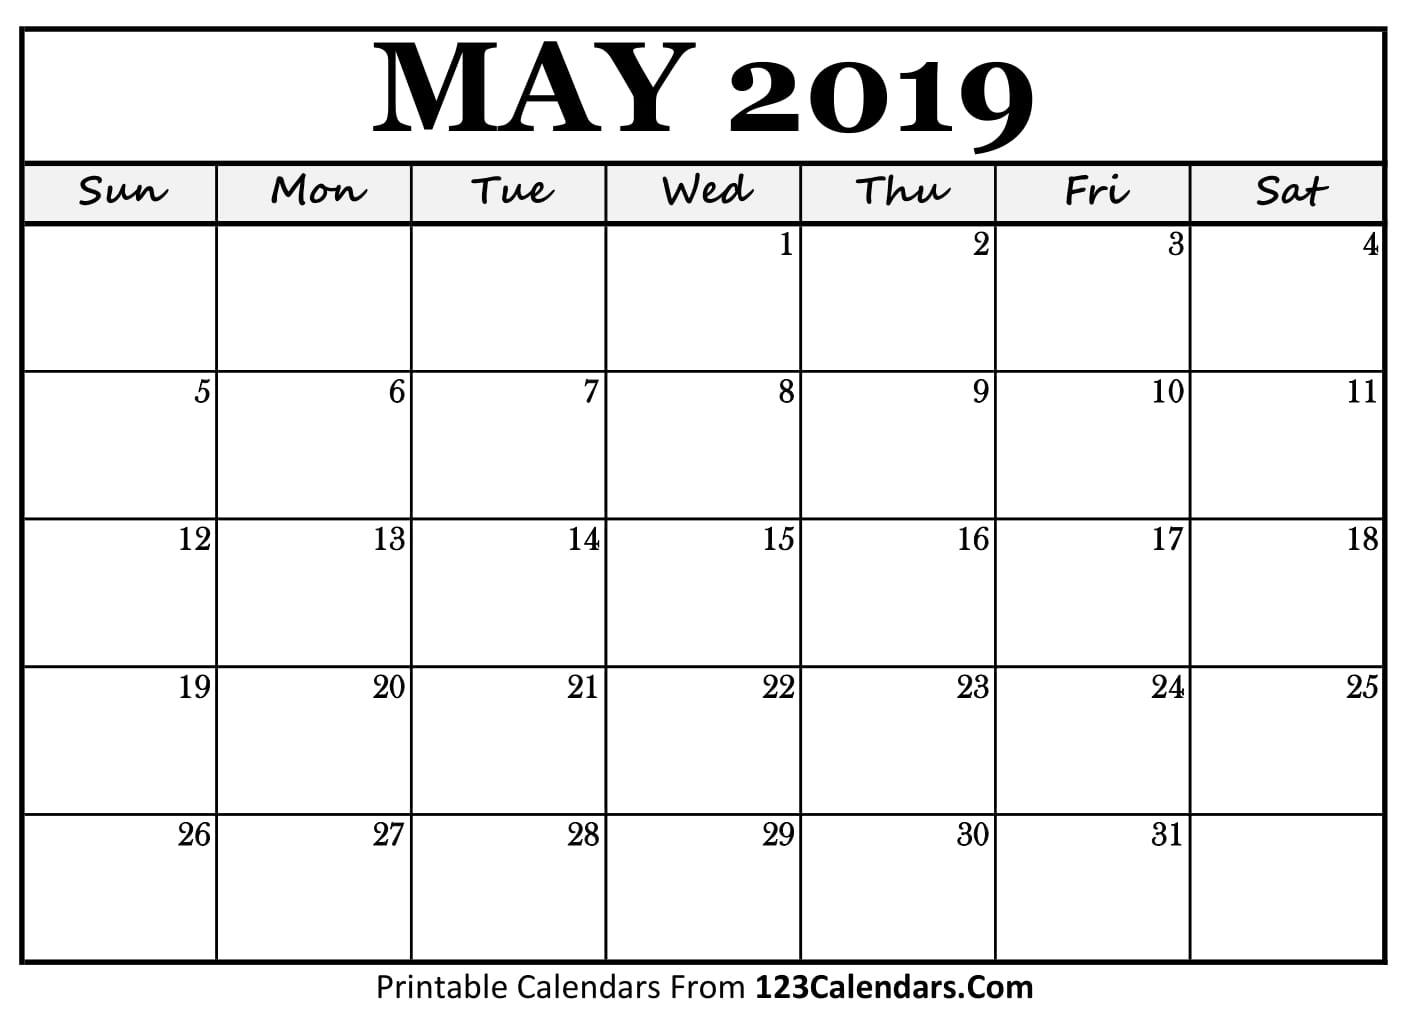 May 2019 Calendar Blank Easily Printable 123calendars